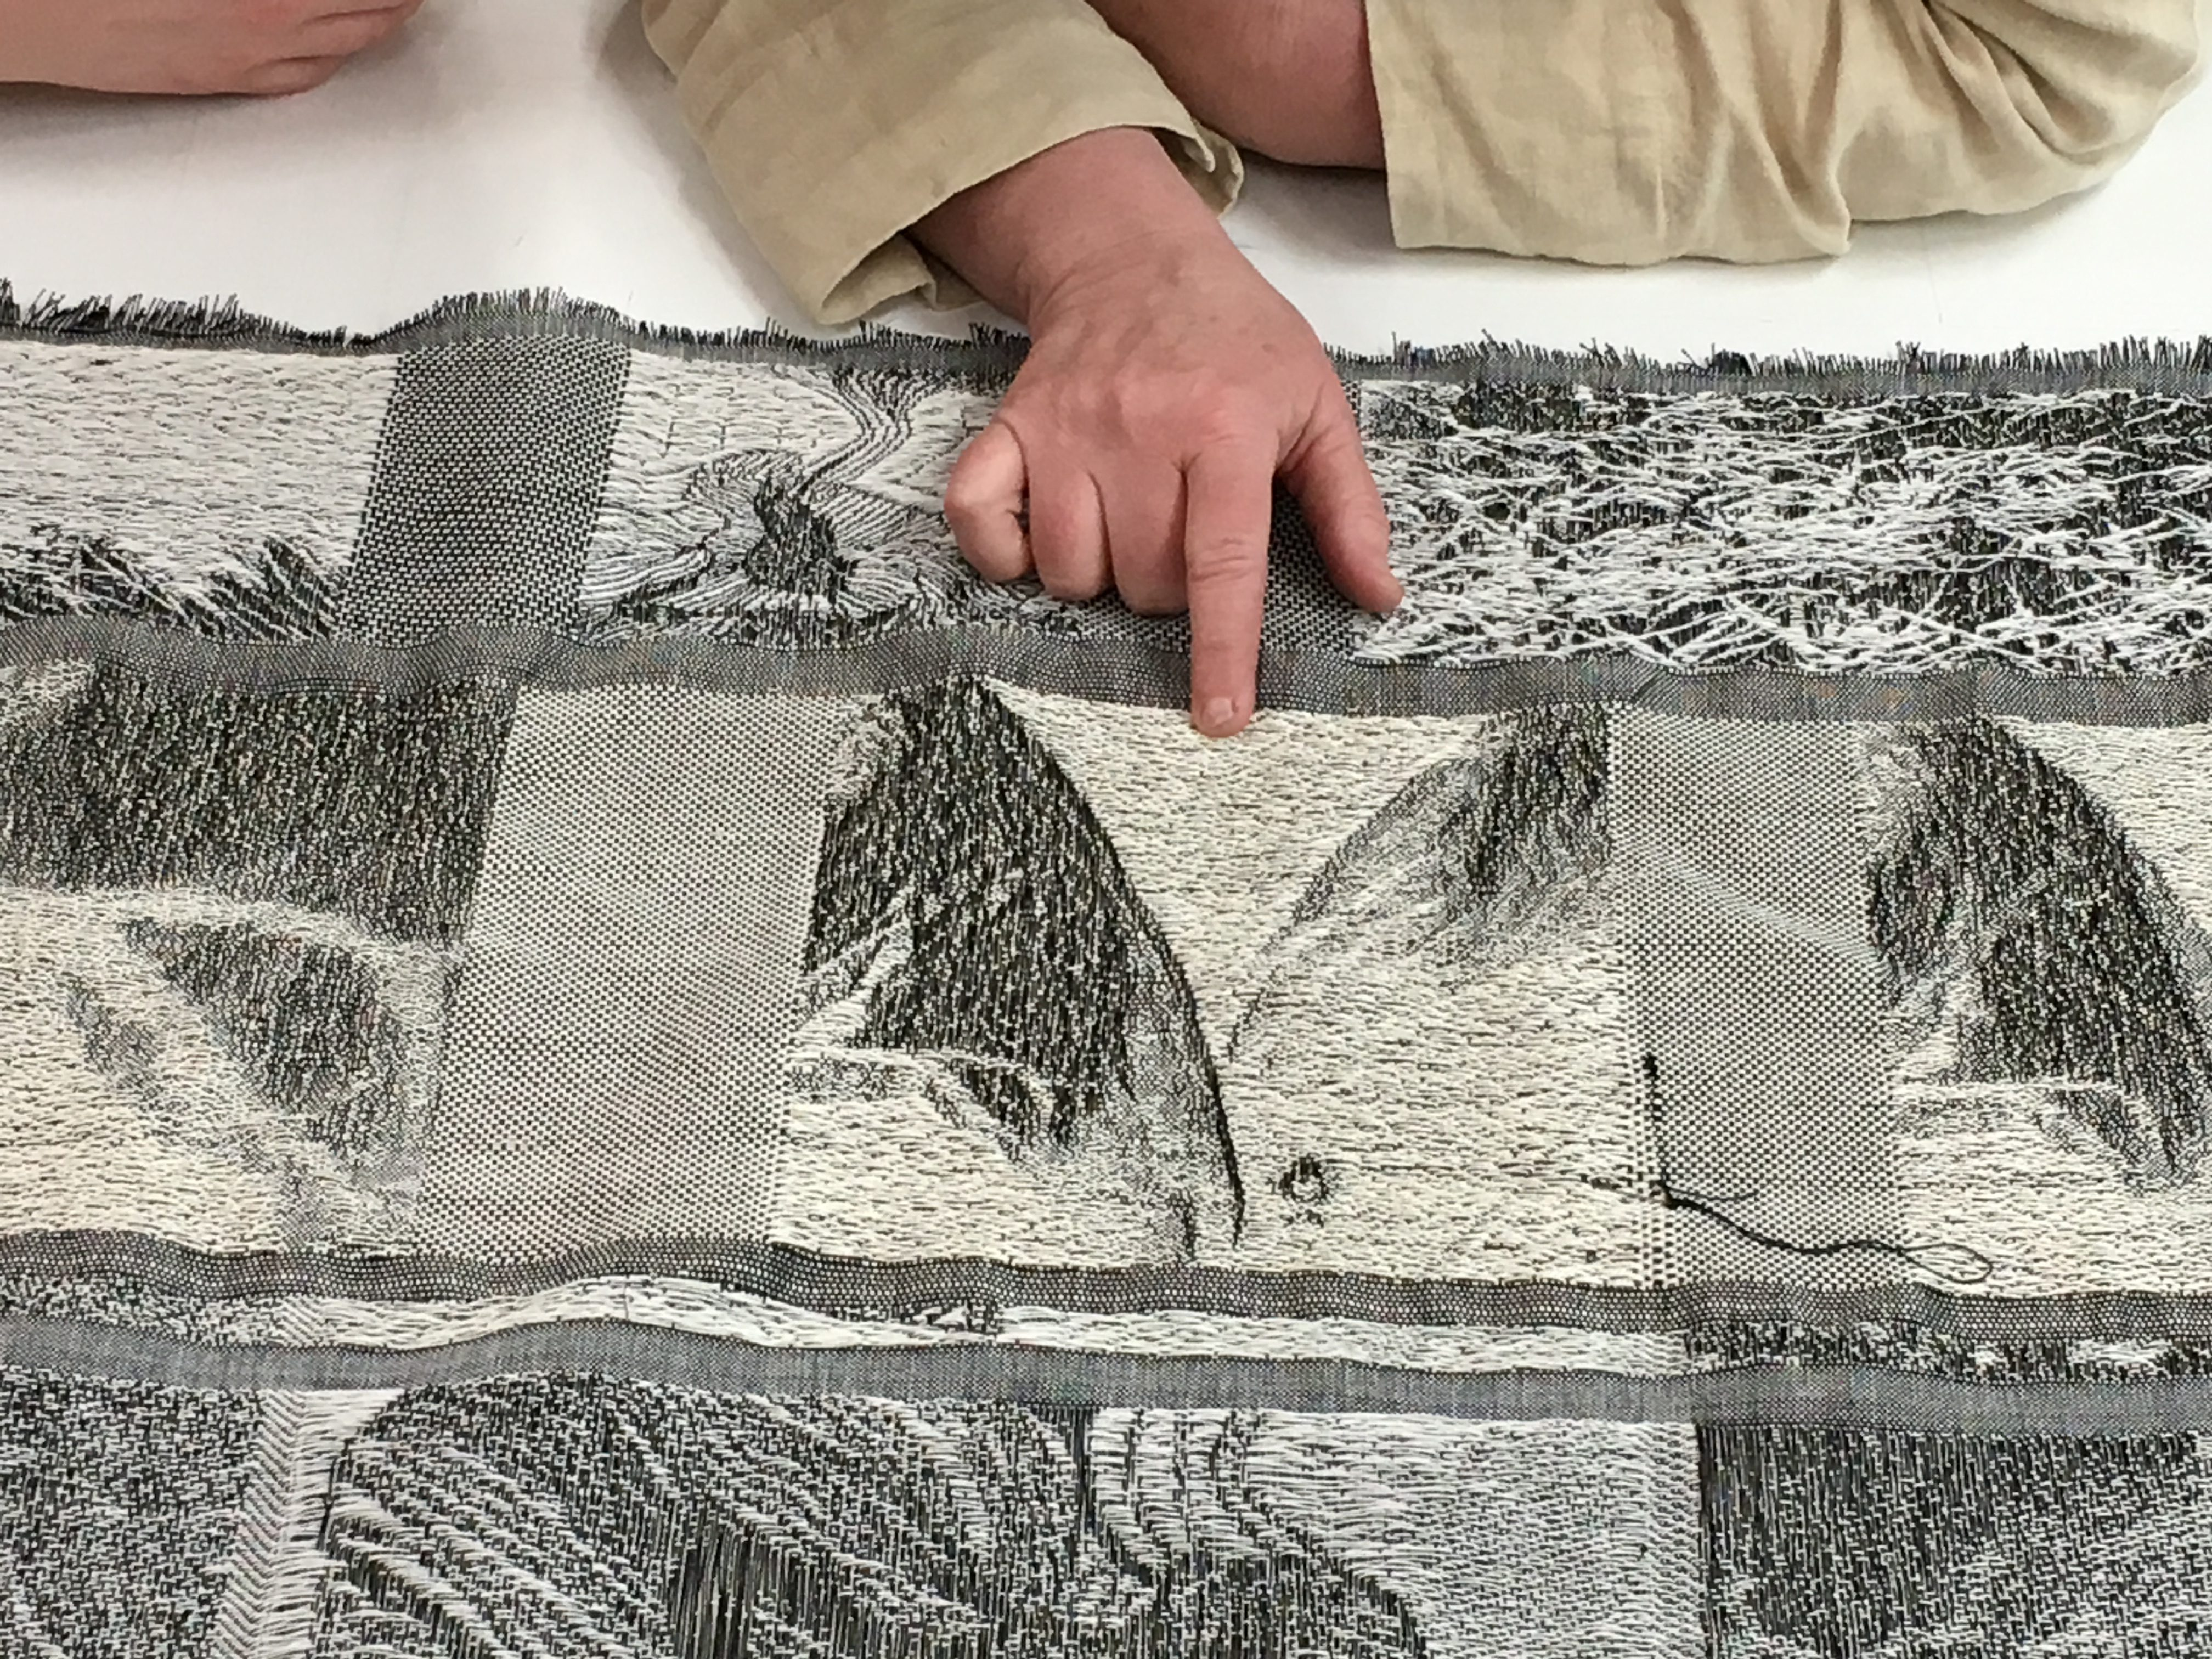 Checking Fabric Design